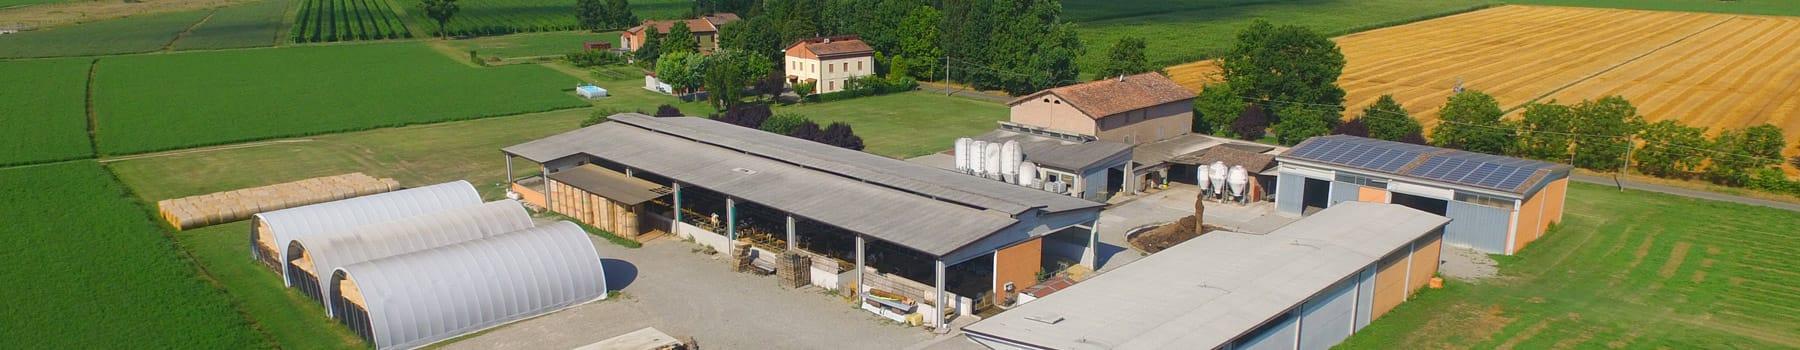 Le aziende agricole